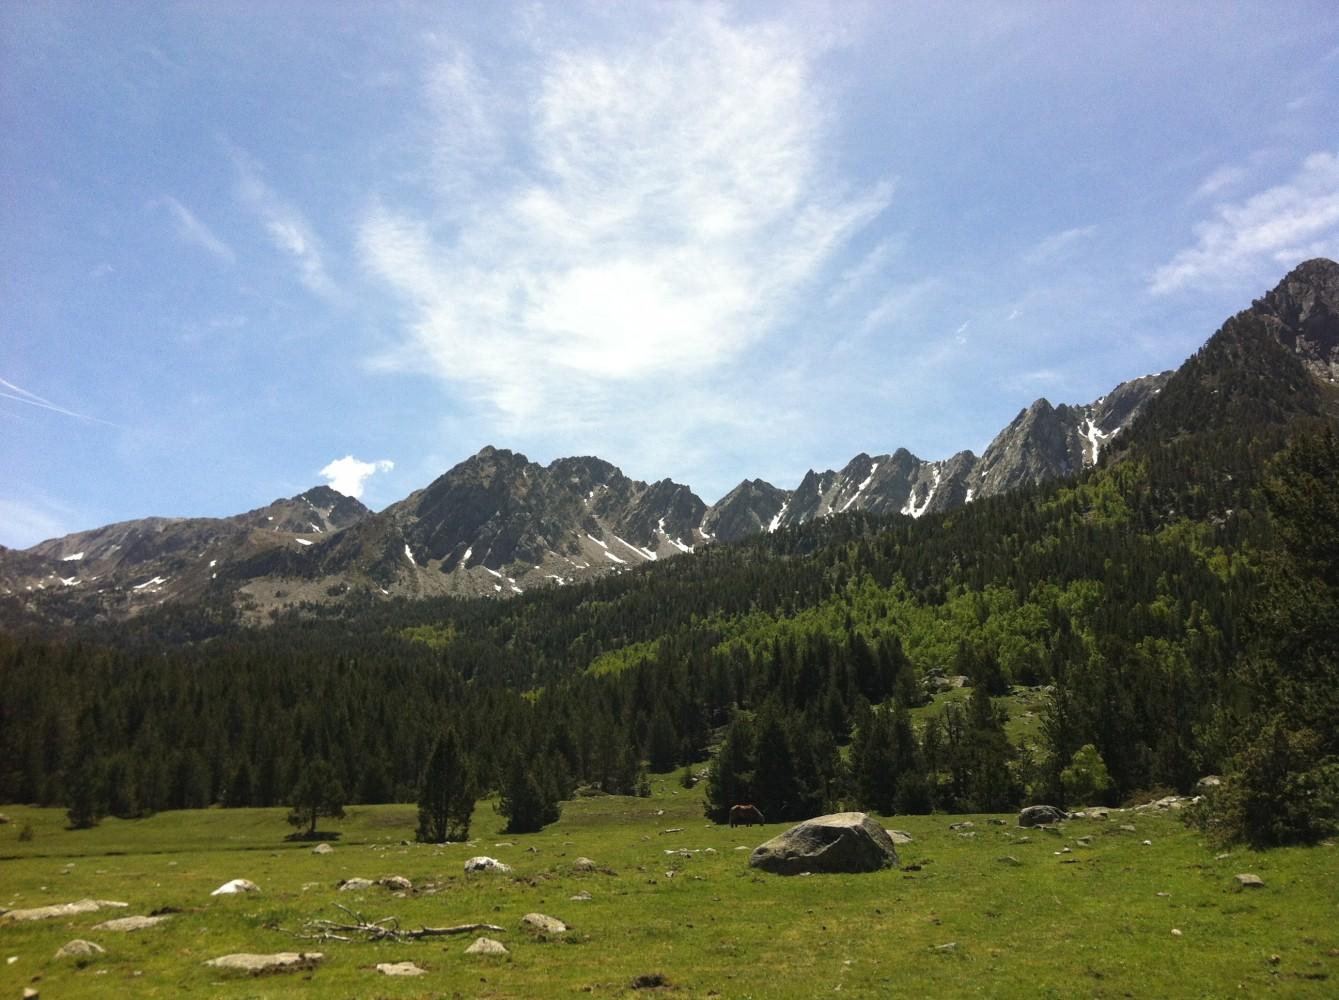 senderismo-hiking-andorra-mountain-hostel-tarter4